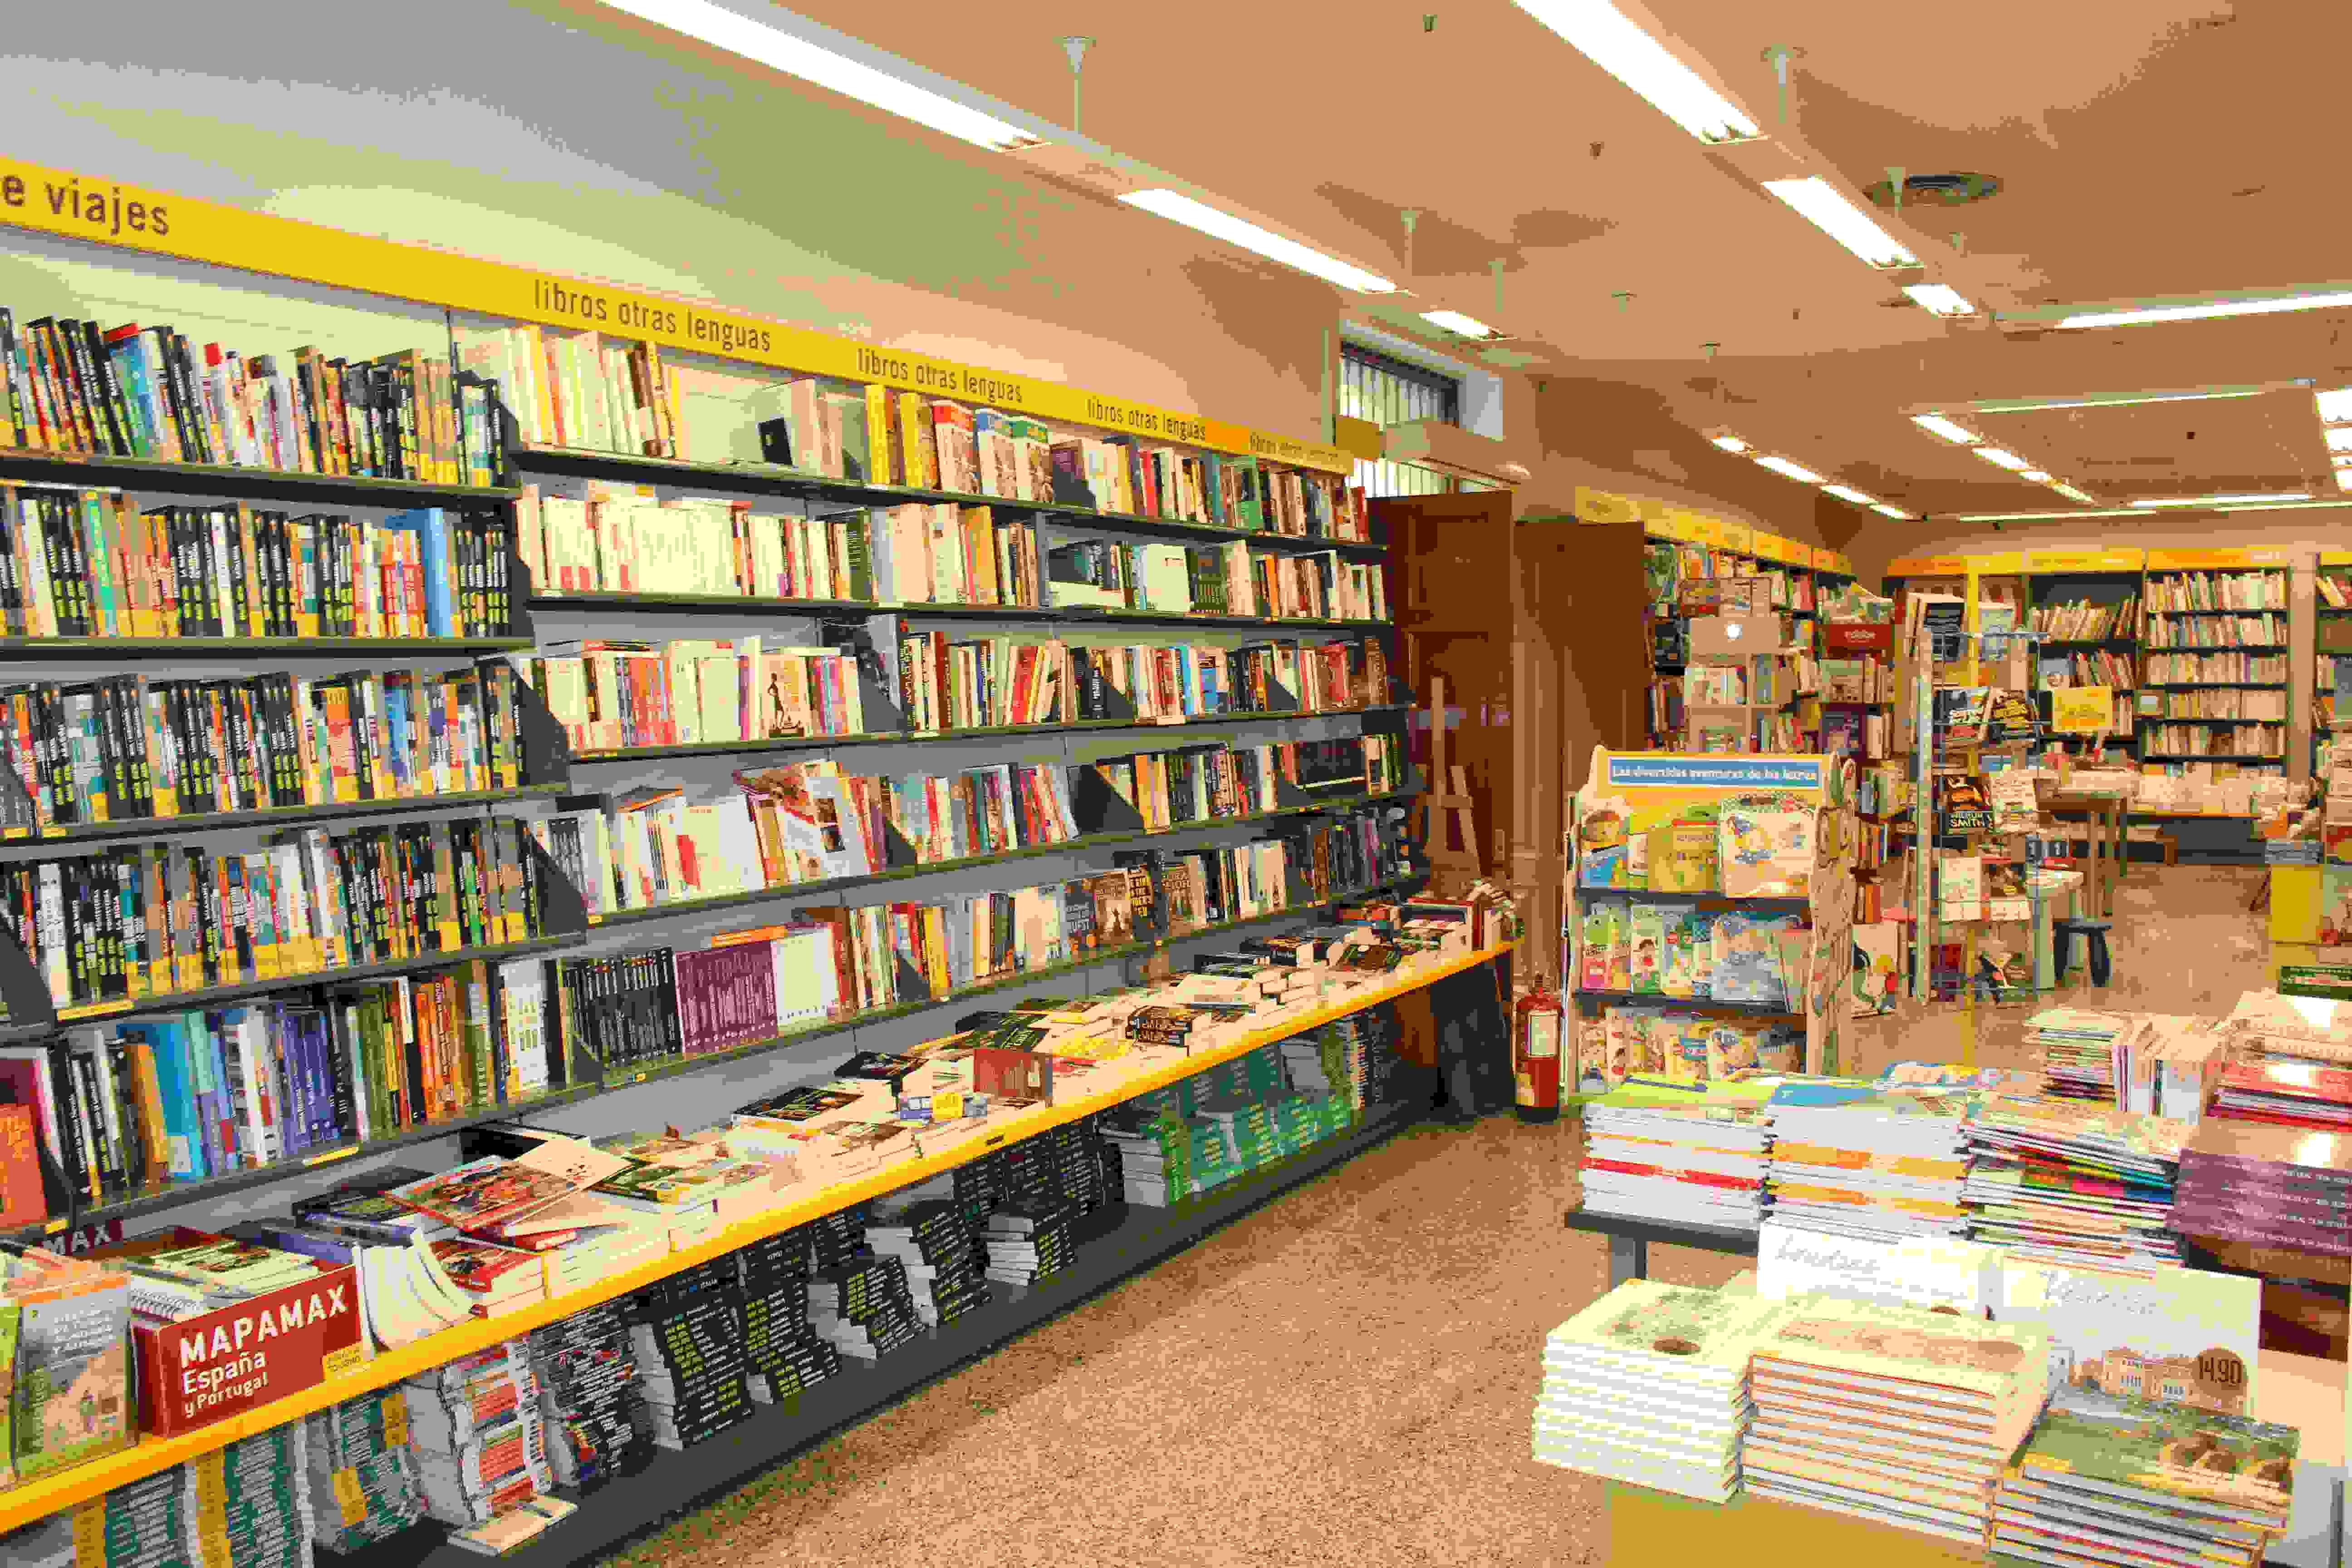 Geslibplus ha sido uno de los salvavidas de librer a luces para estos a os de crisis grupo - Libreria de luces ...